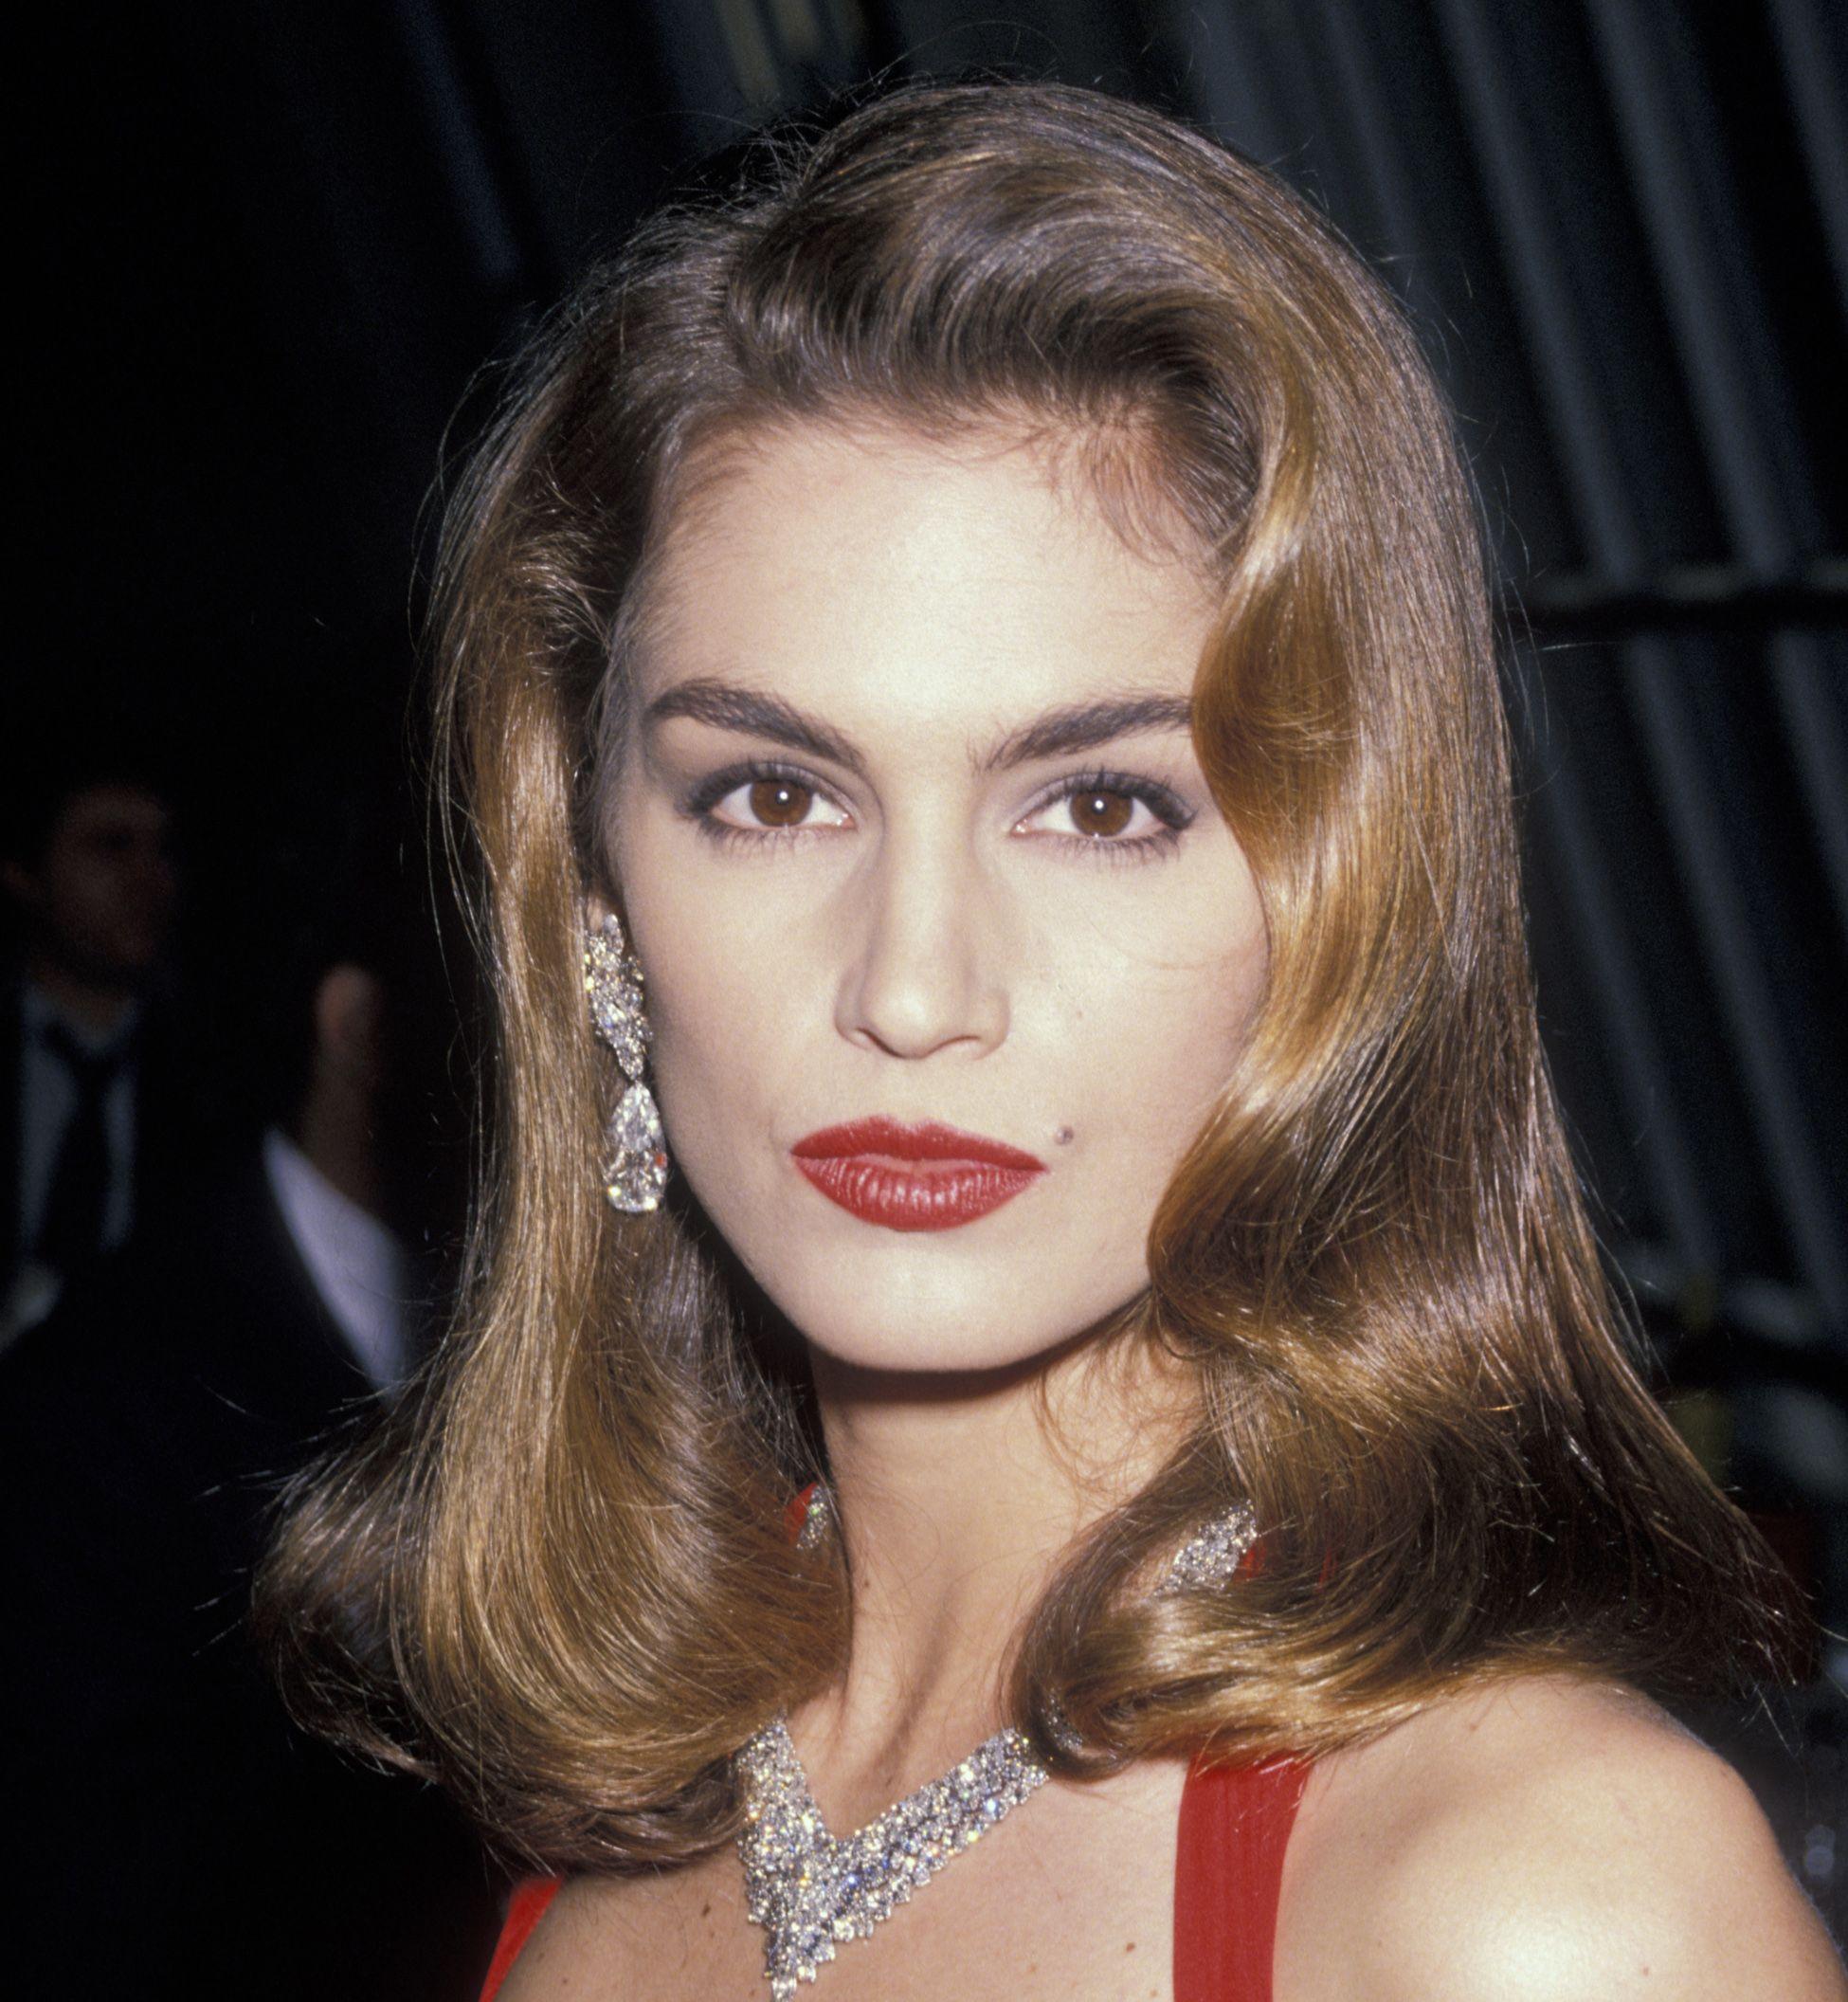 Revlon's Unforgettable Women of 1990